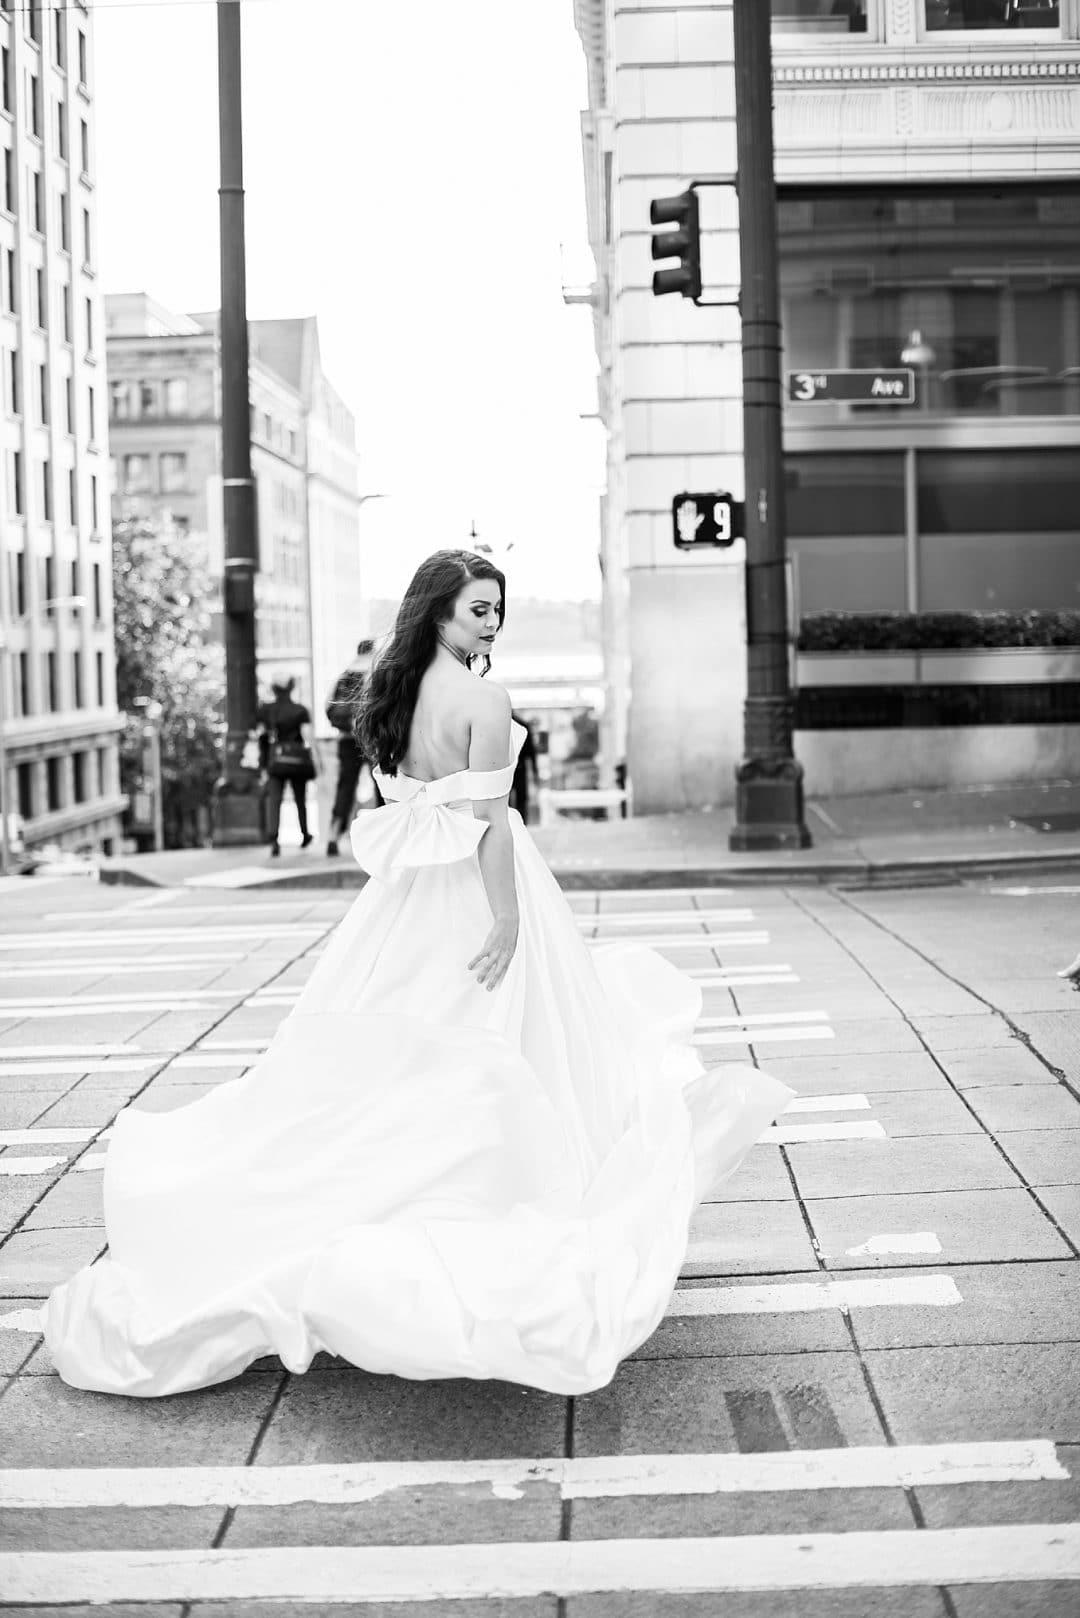 Wedding -  - nkimaphotography com notting hill 0328